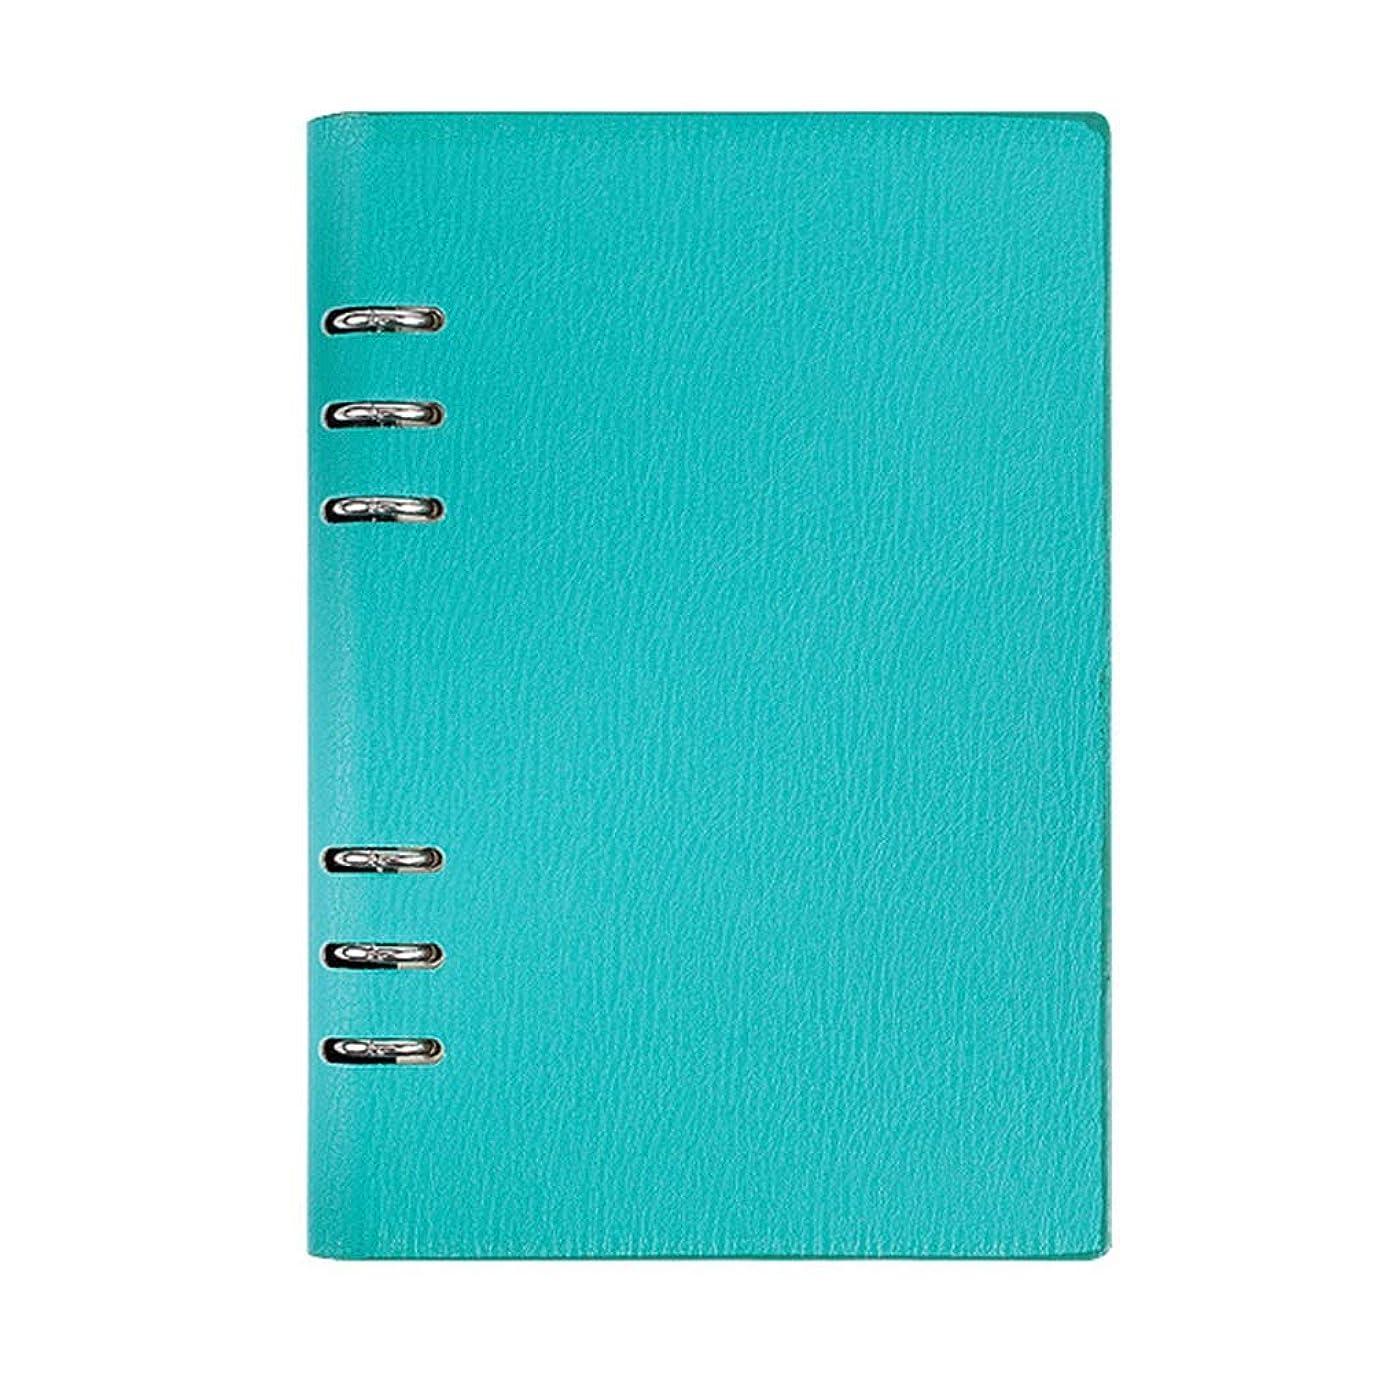 A5ノートブックビジネスルーズリーフジャーナルシンプルな厚手のメモ帳レザー会議記録帳 Blingstars (Color : Green)